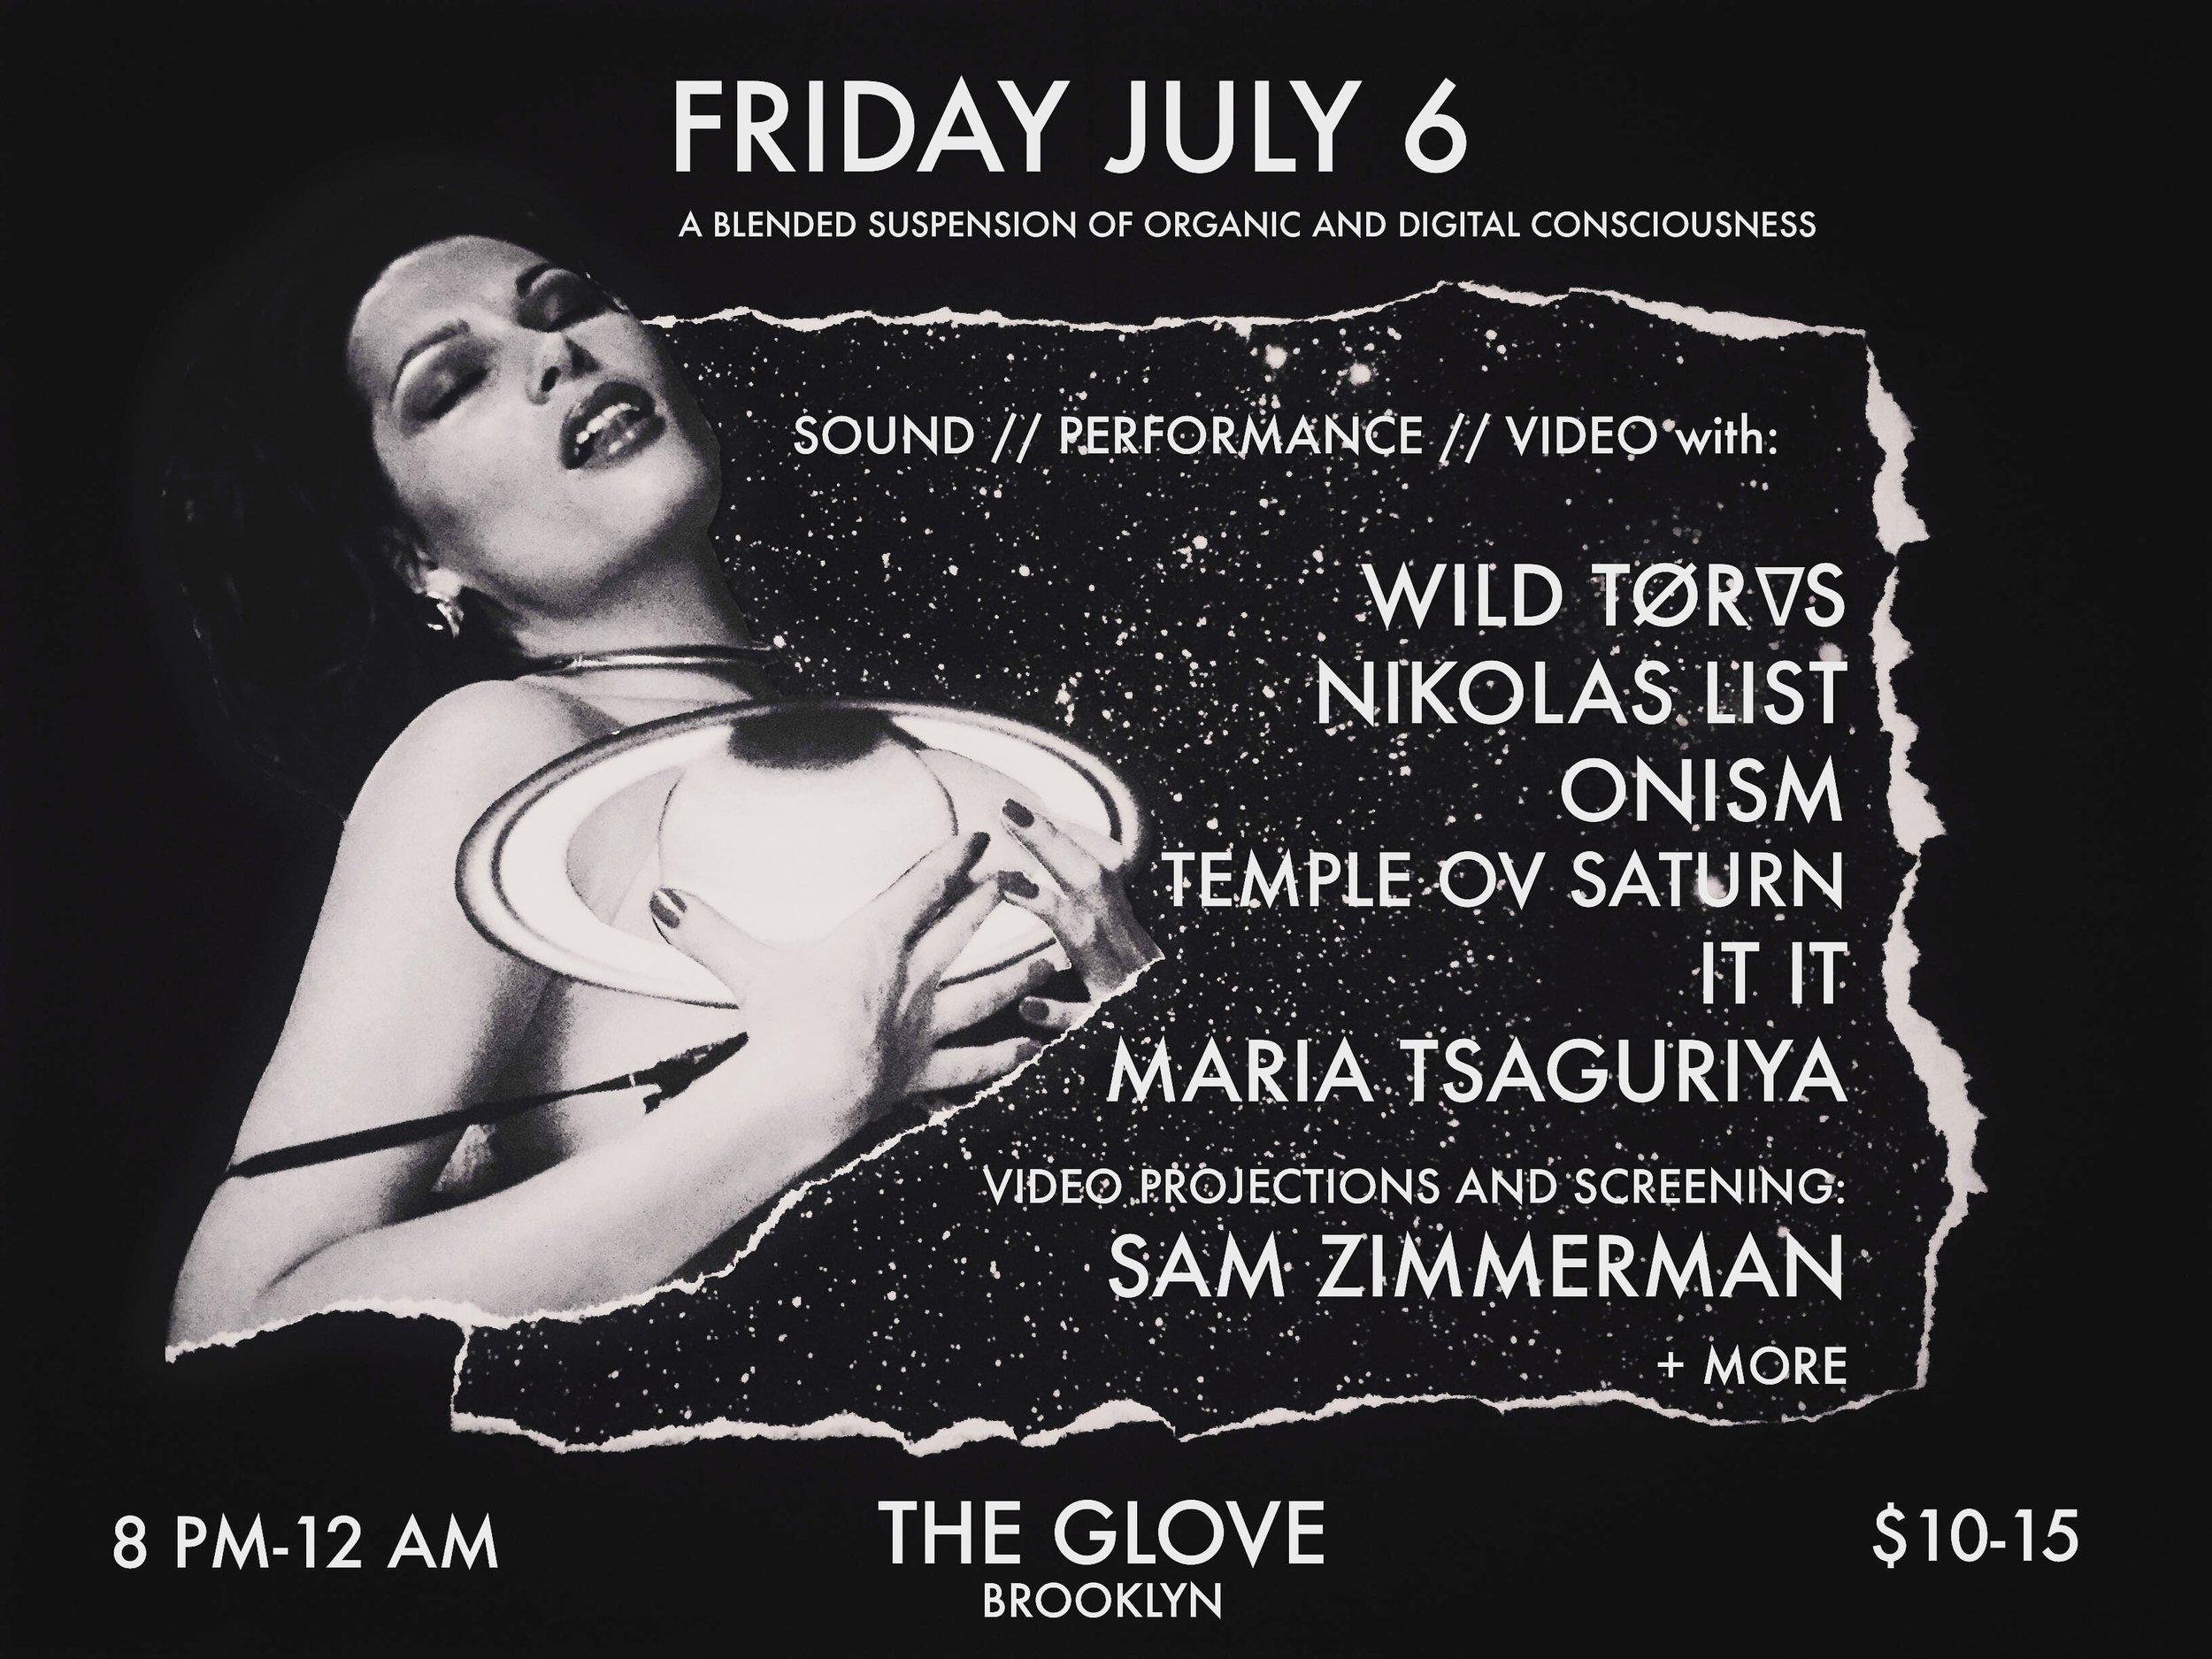 Flyer for Temple ov Saturn gig in Brooklyn on July 6